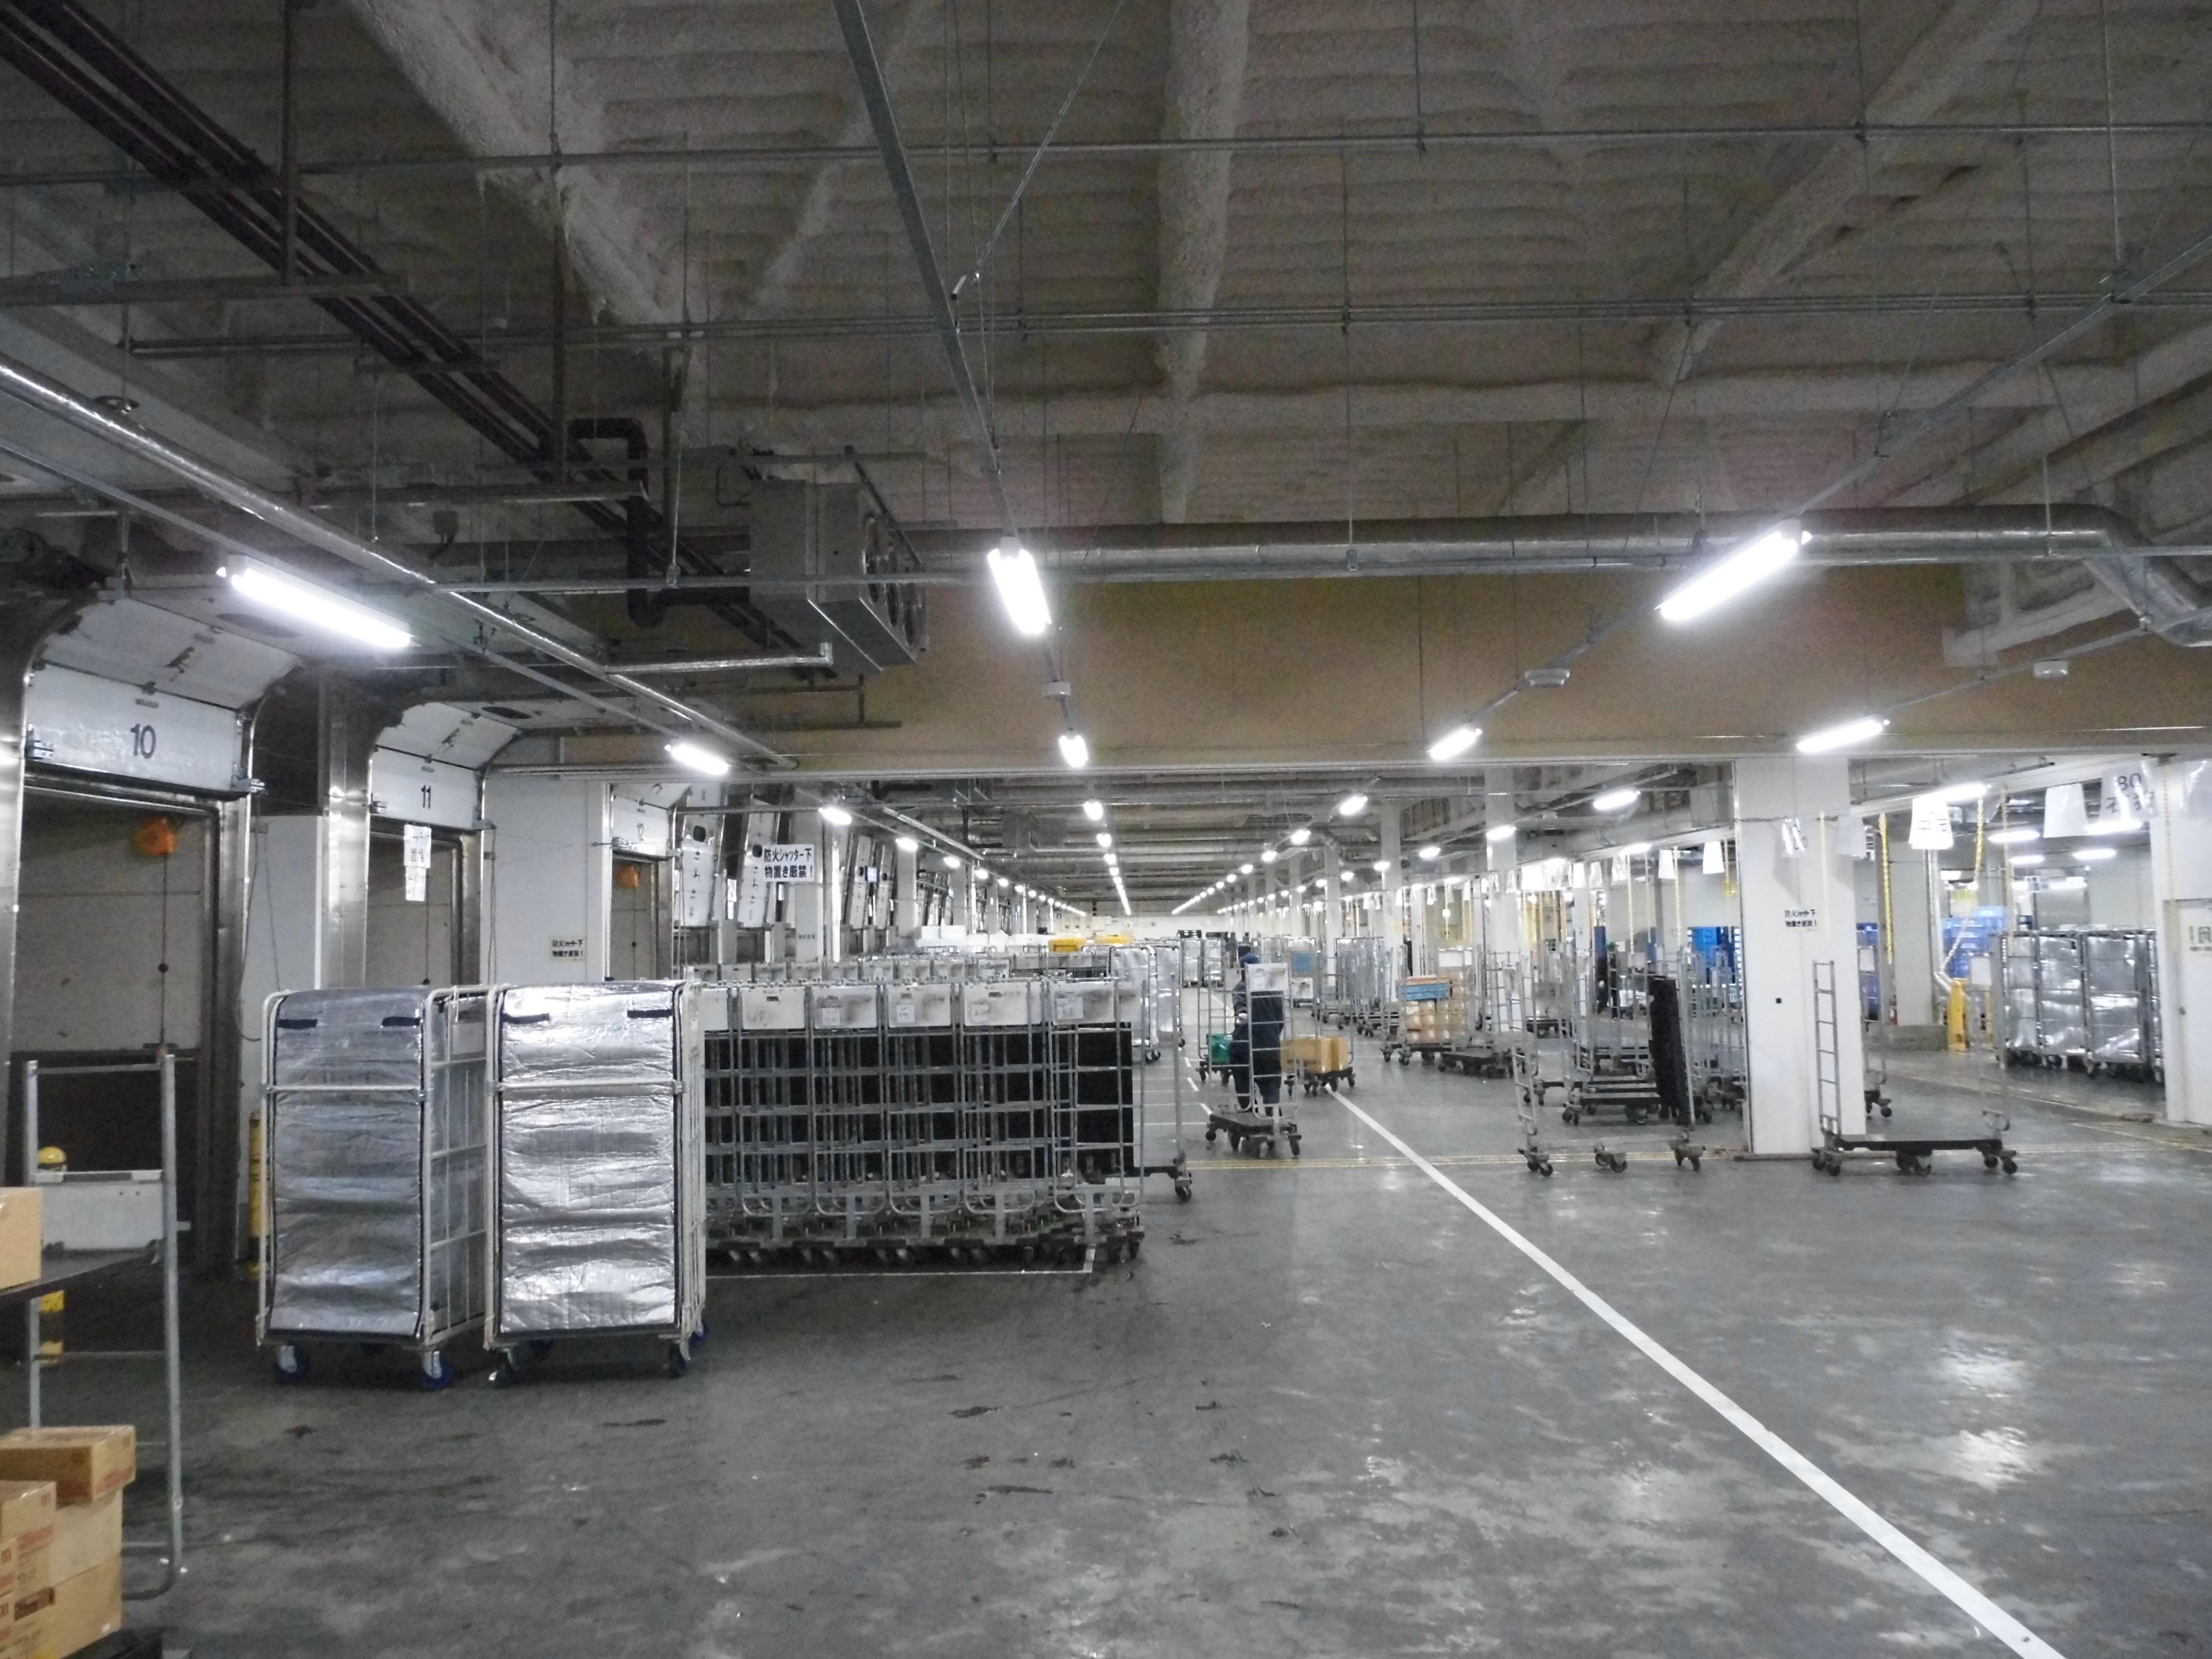 【冷凍・冷蔵食品】拠点間輸送カゴ車の受払管理、棚卸に活用